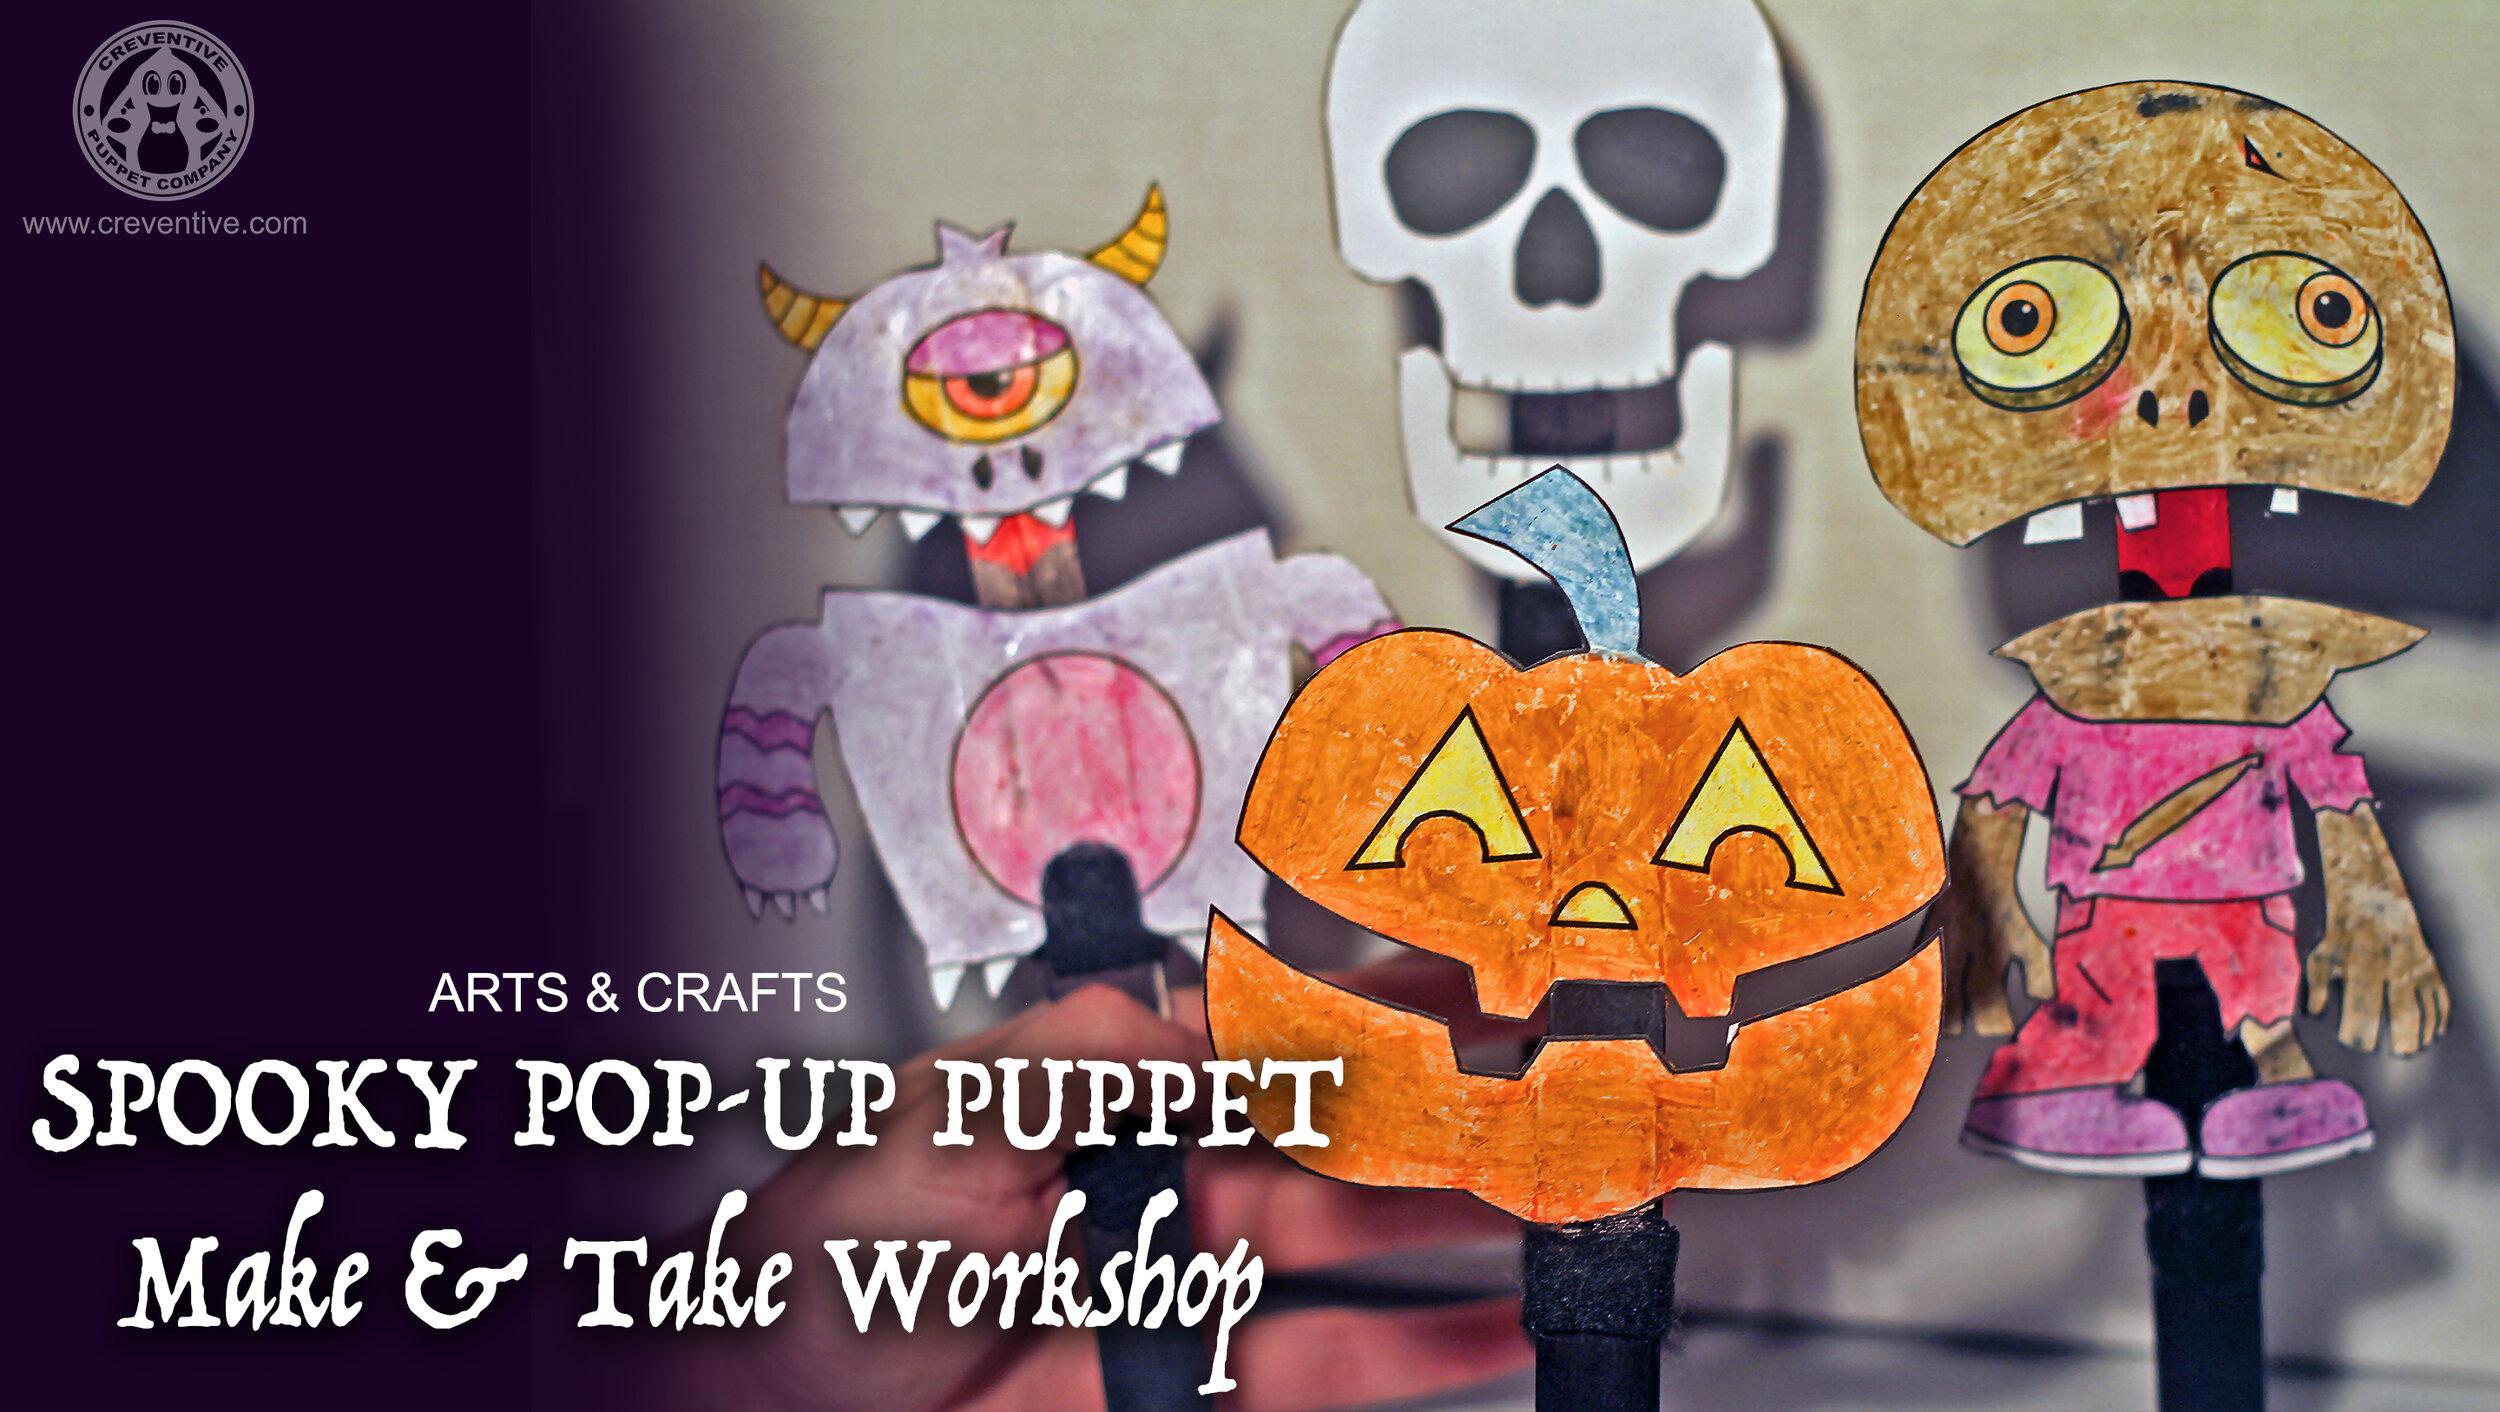 CPC_Spooky_Pop-up_Puppets_MakeAndTake_Art_Craft_Workshop_Banner.jpg